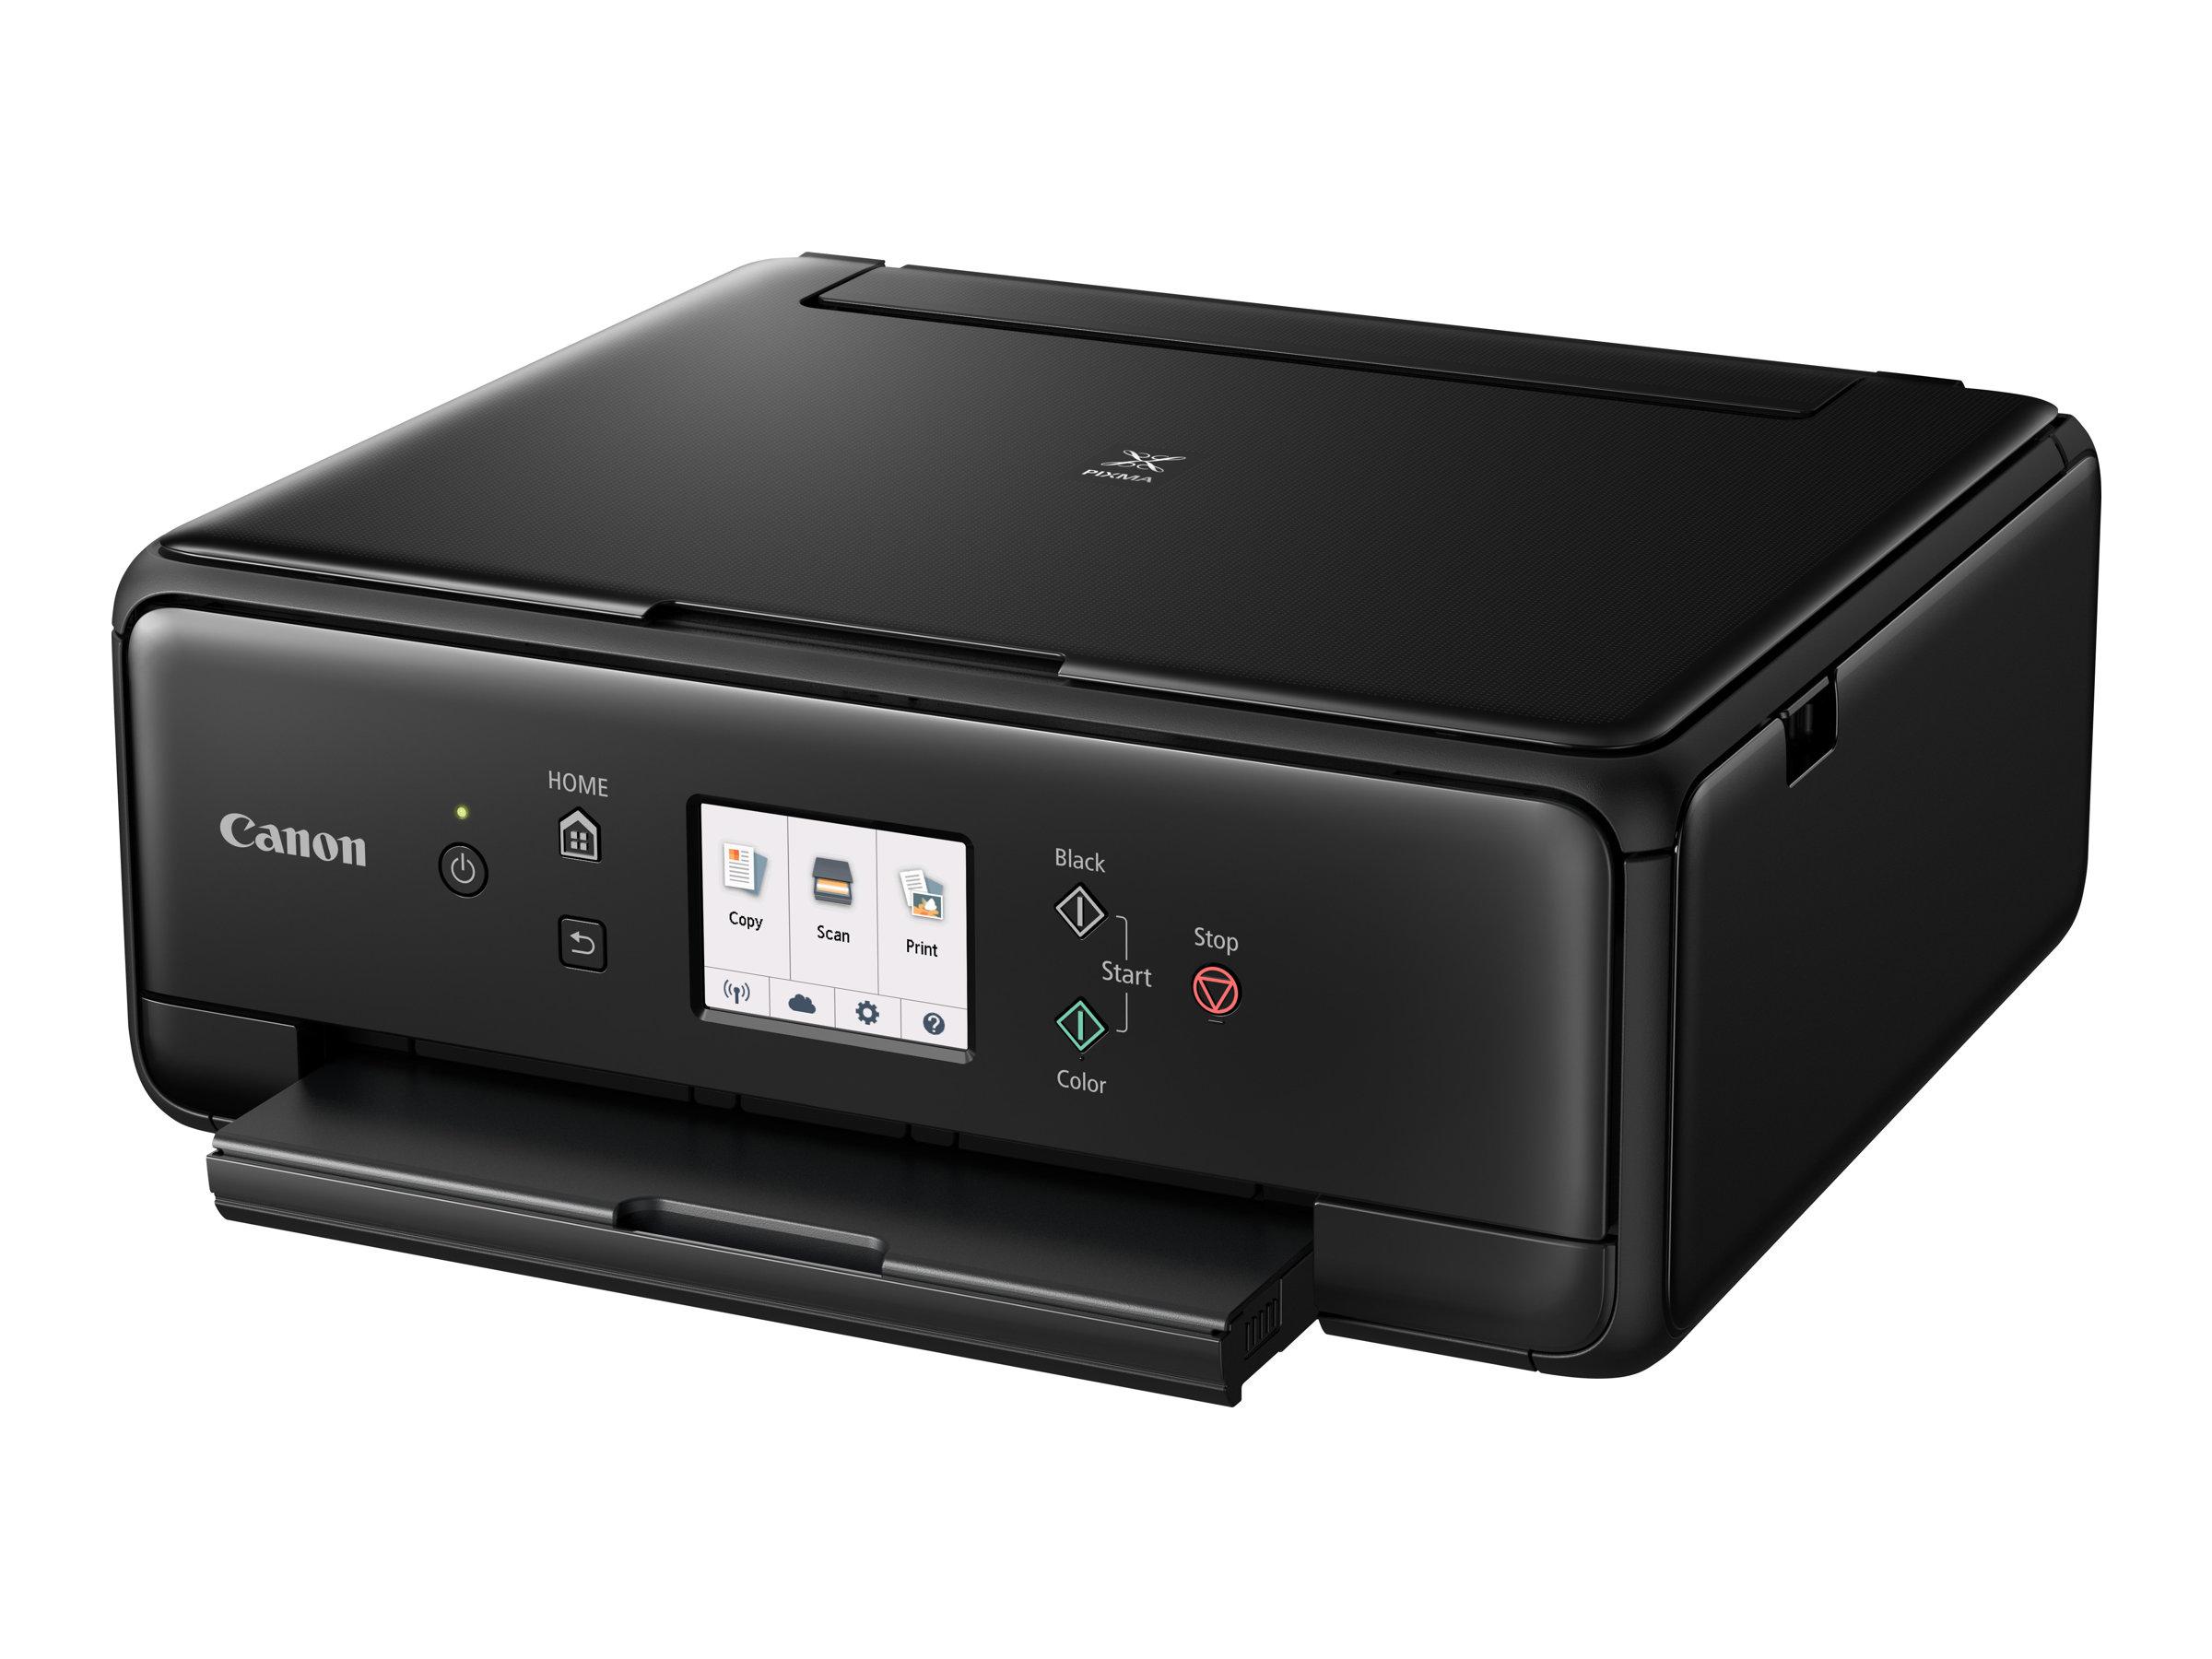 Canon PIXMA TS6150 - Multifunktionsdrucker - Farbe - Tintenstrahl - 216 x 297 mm (Original)